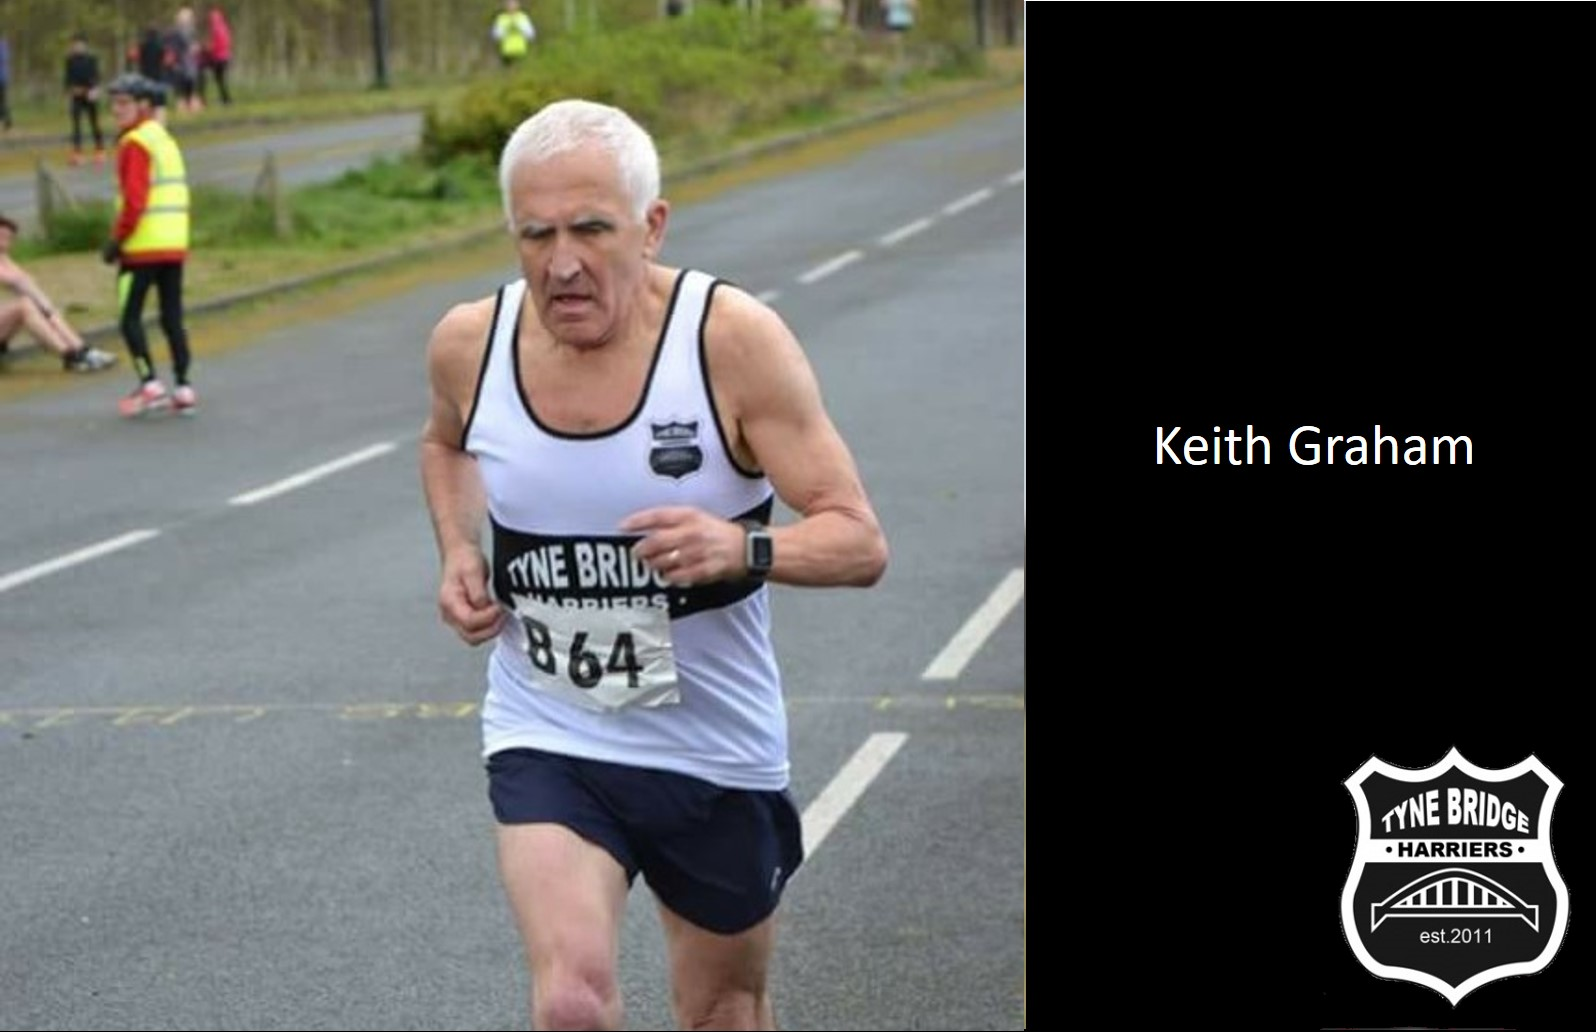 Graham-Keith